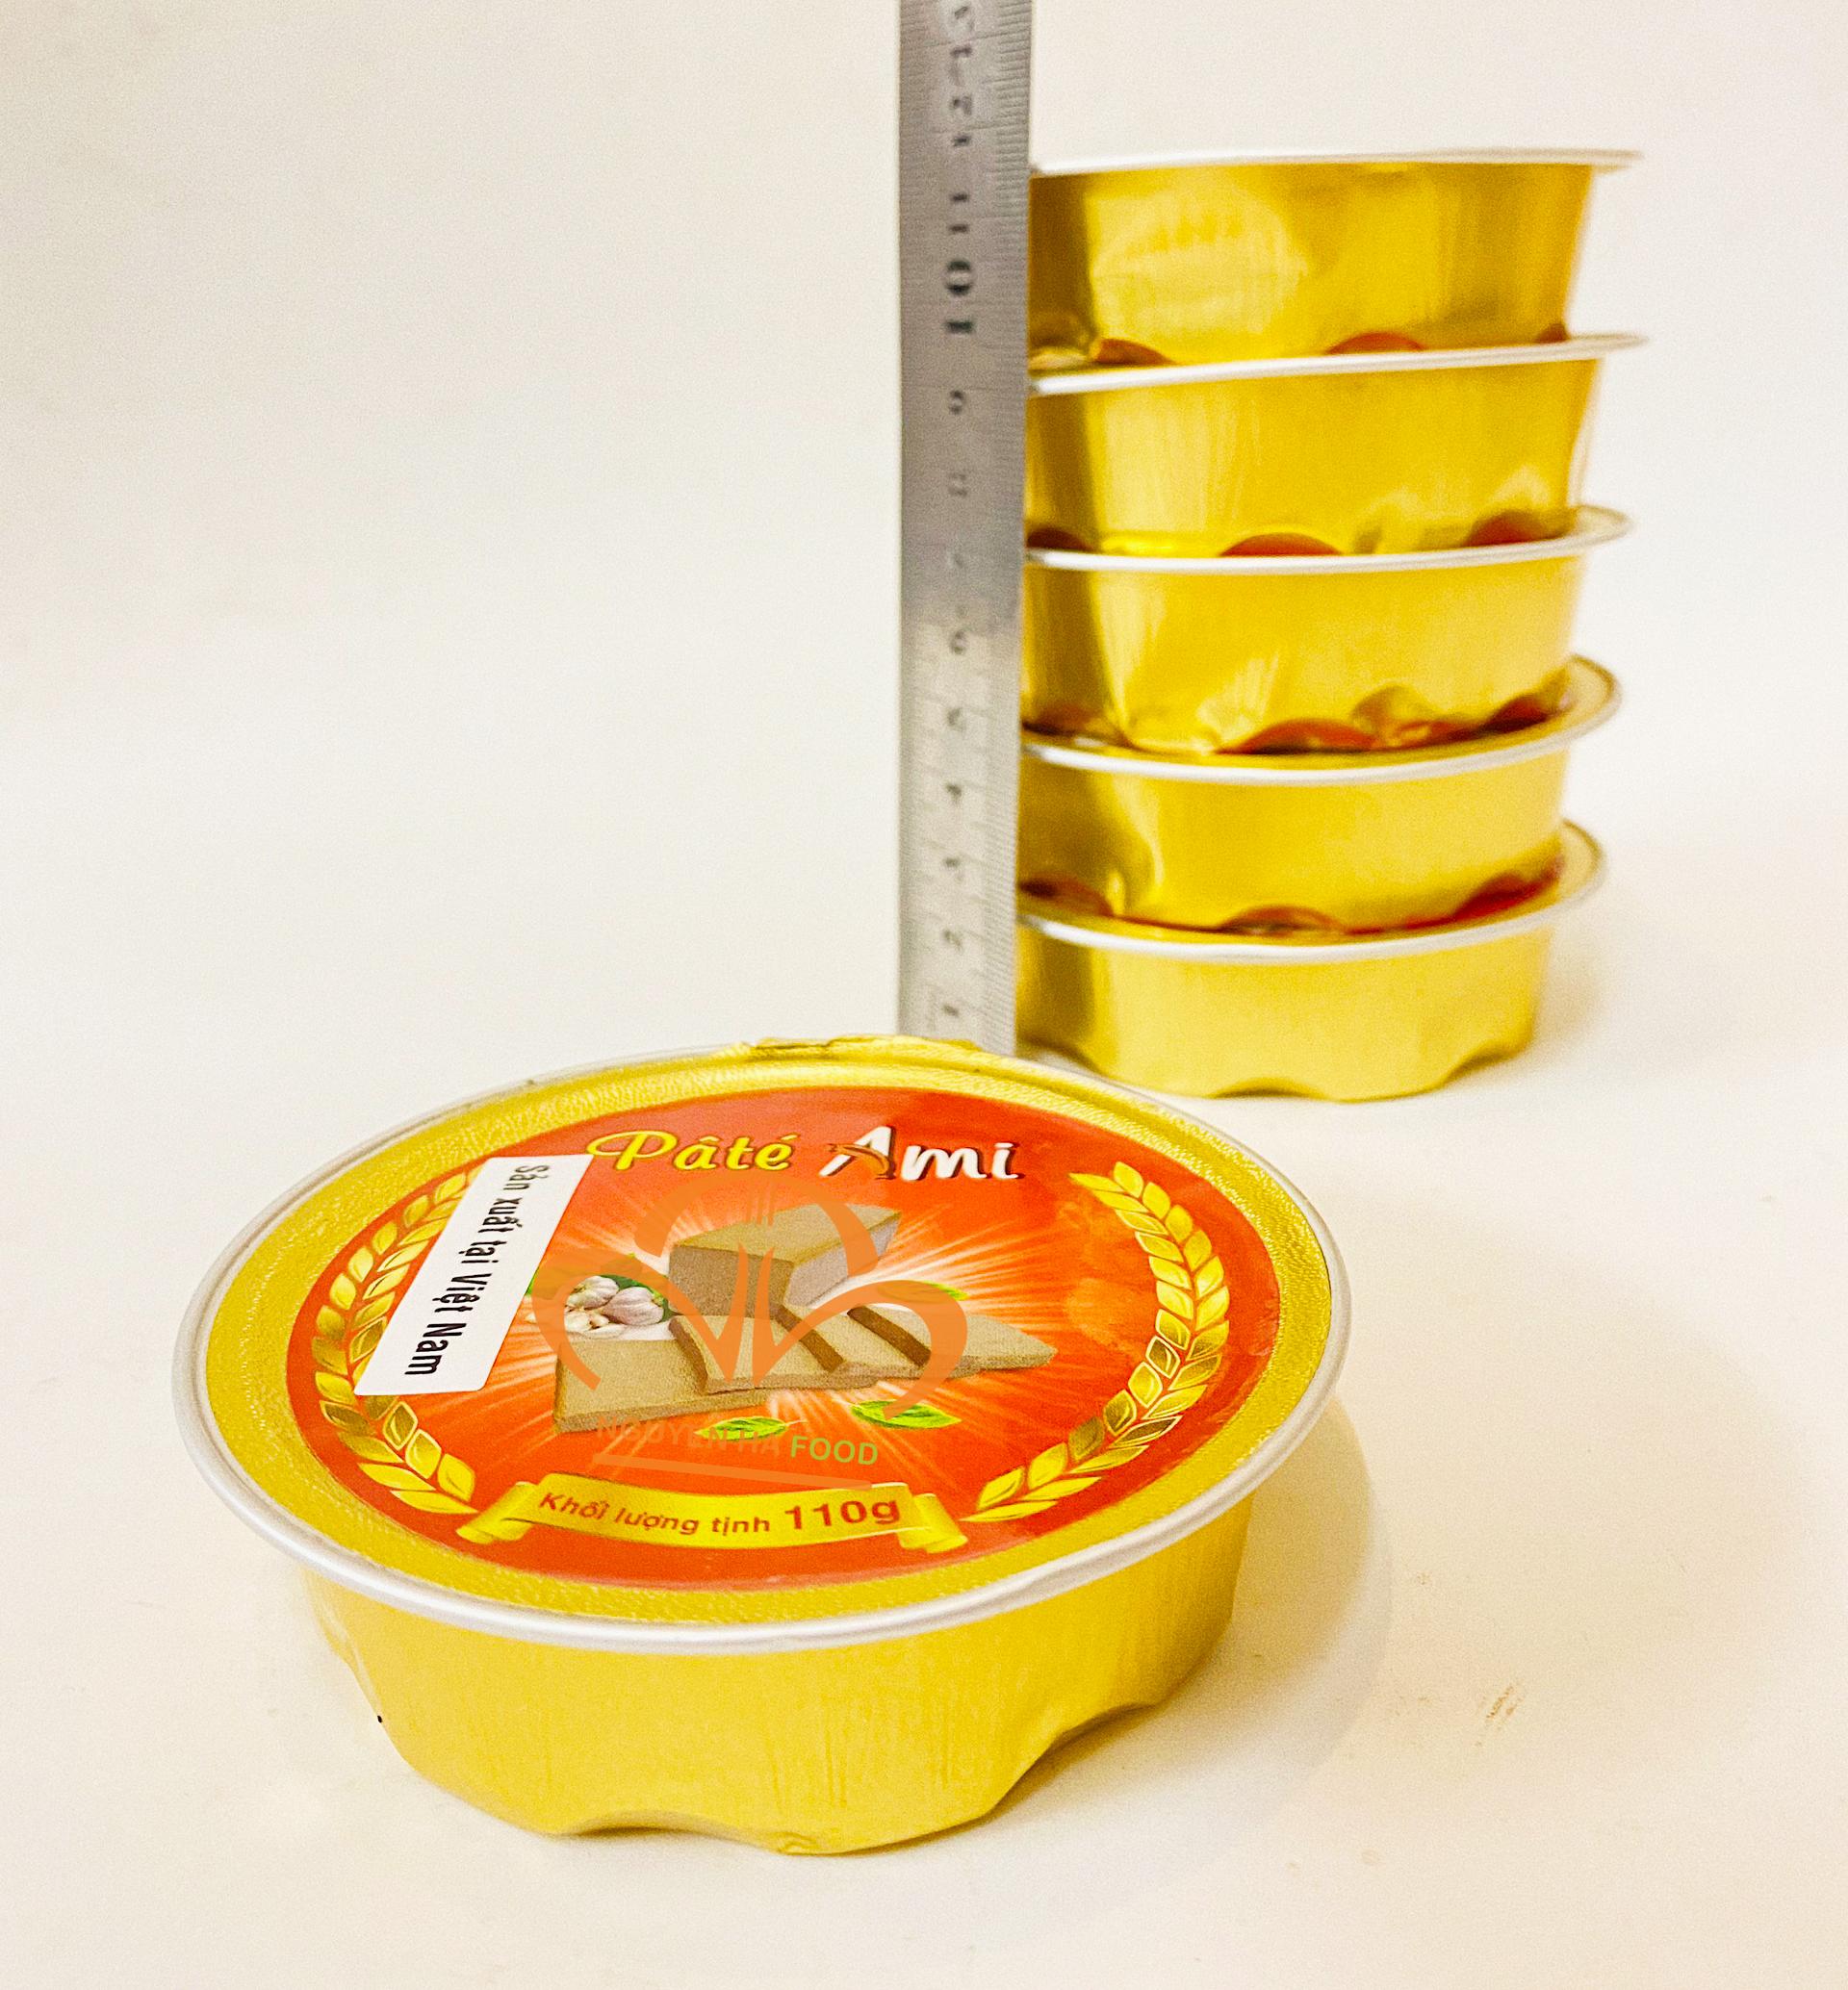 pate heo ami nipponham hop 110g nguyen ha food (9)